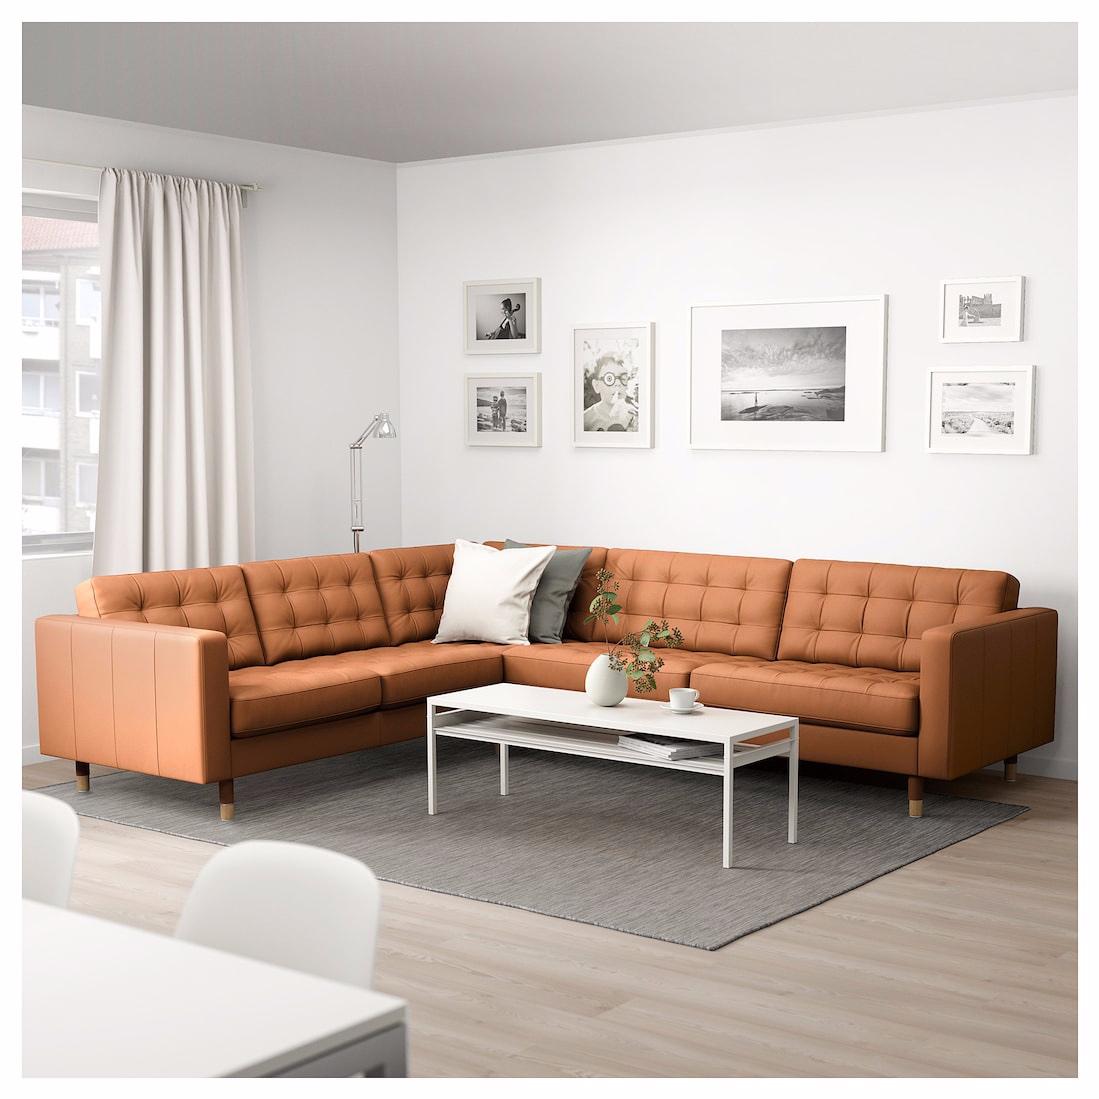 LANDSKRONA - IKEA